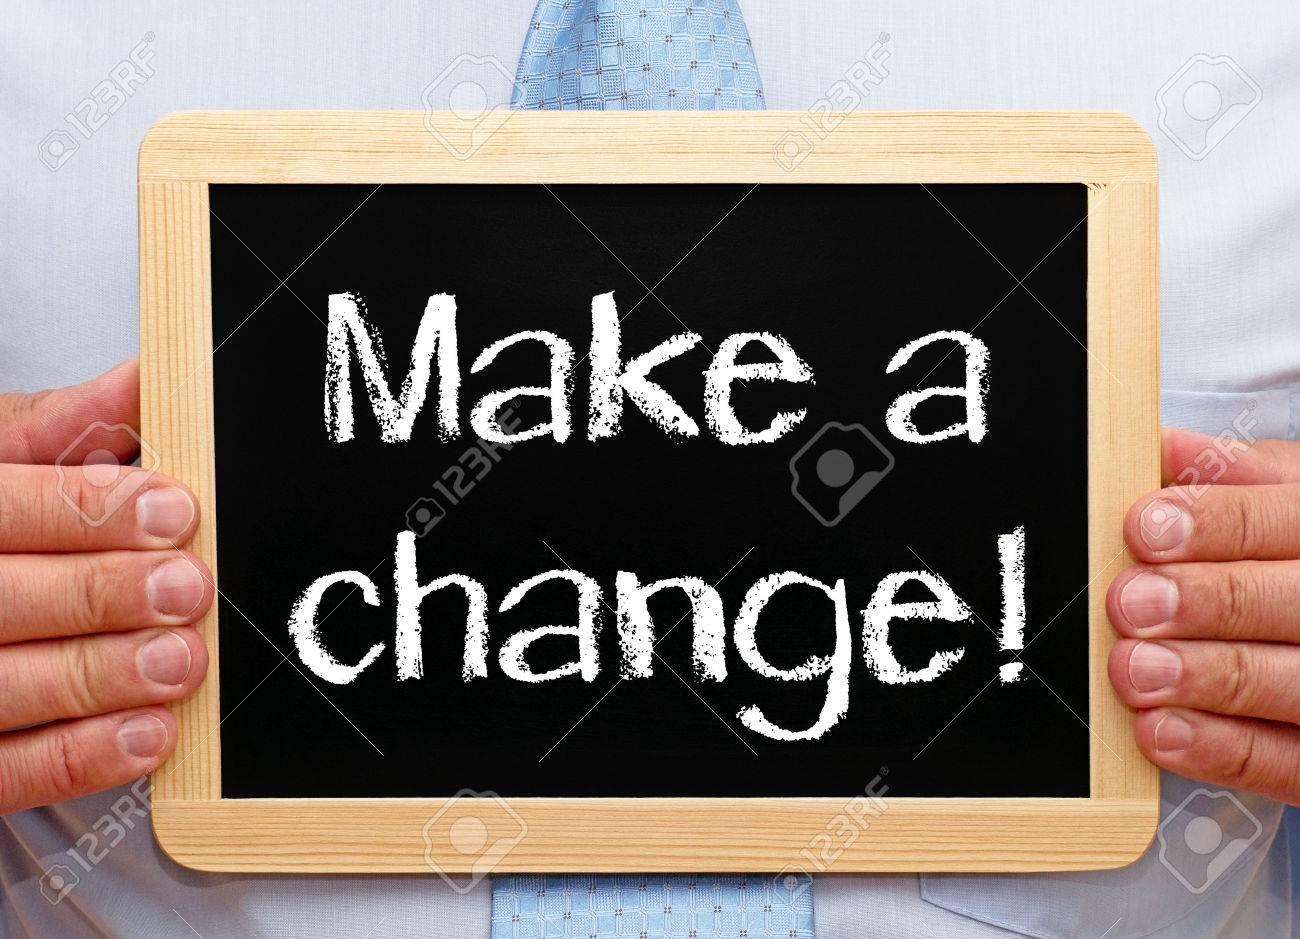 Make a change Stock Photo - 25519469